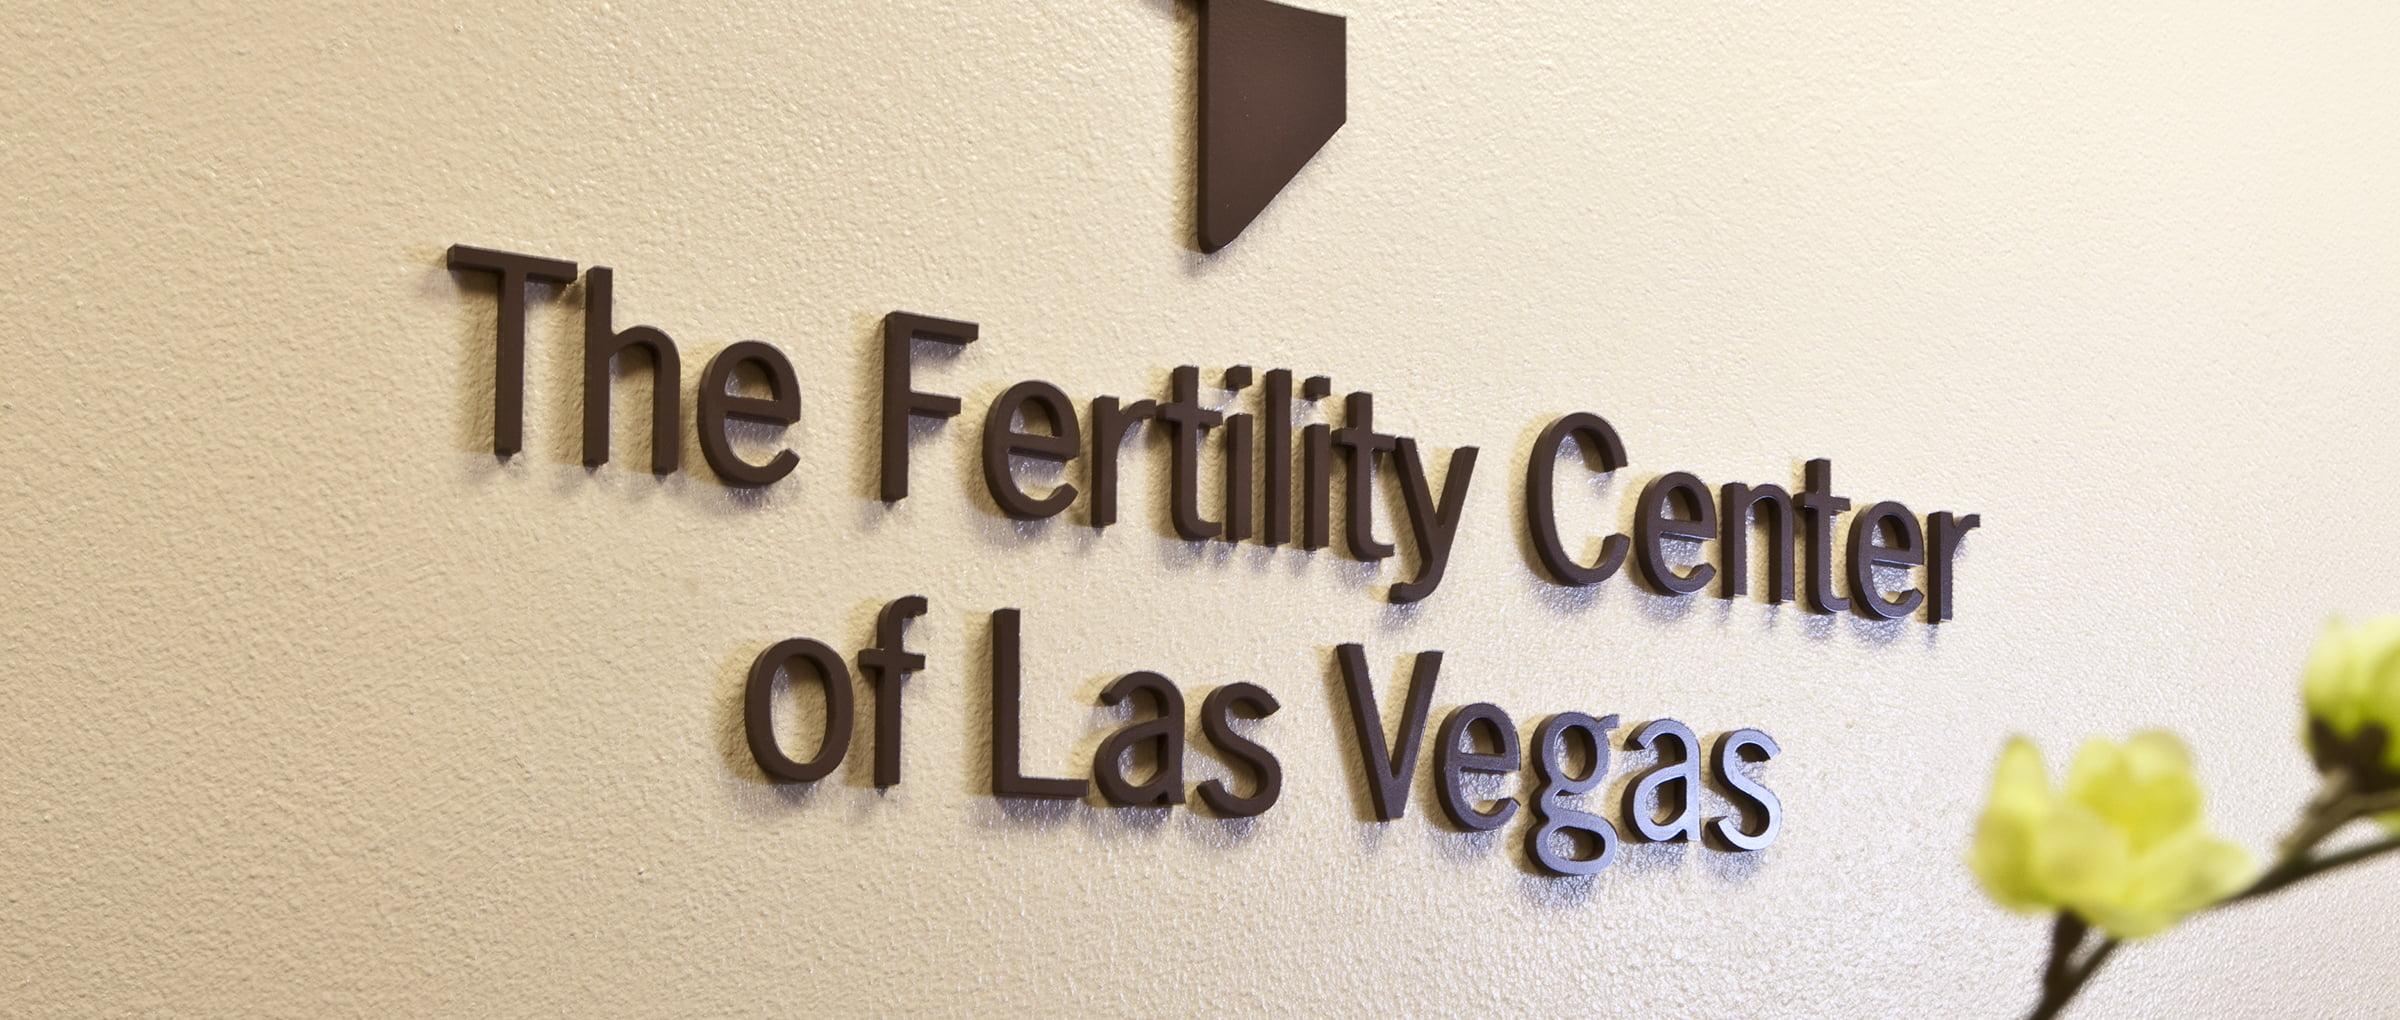 The Fertility Center of Las Vegas